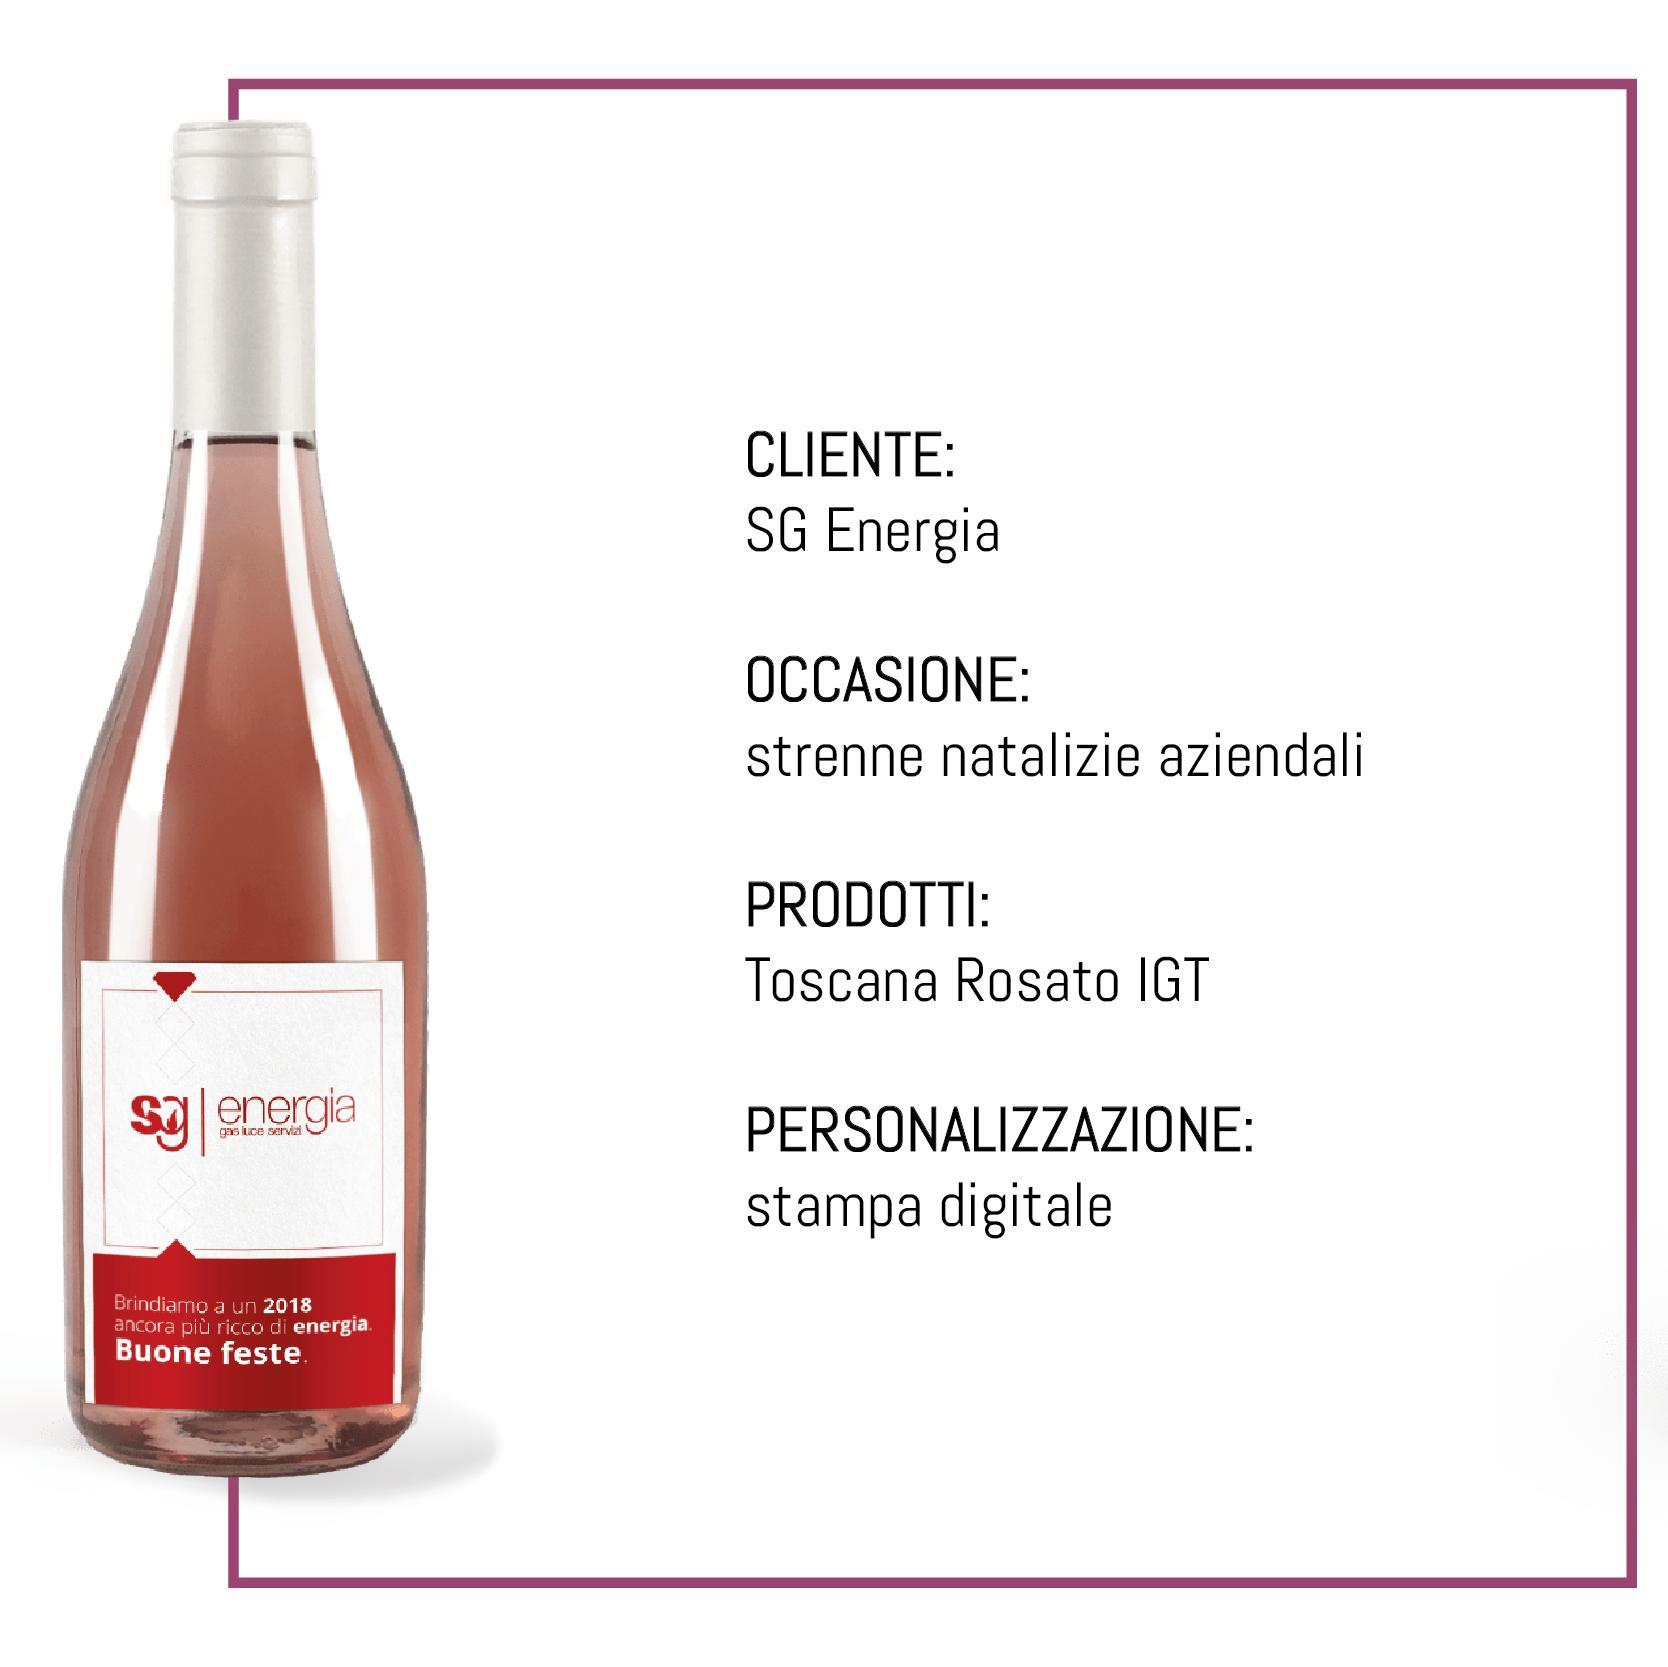 bottiglia personalizzata strenne natalizie sg energia